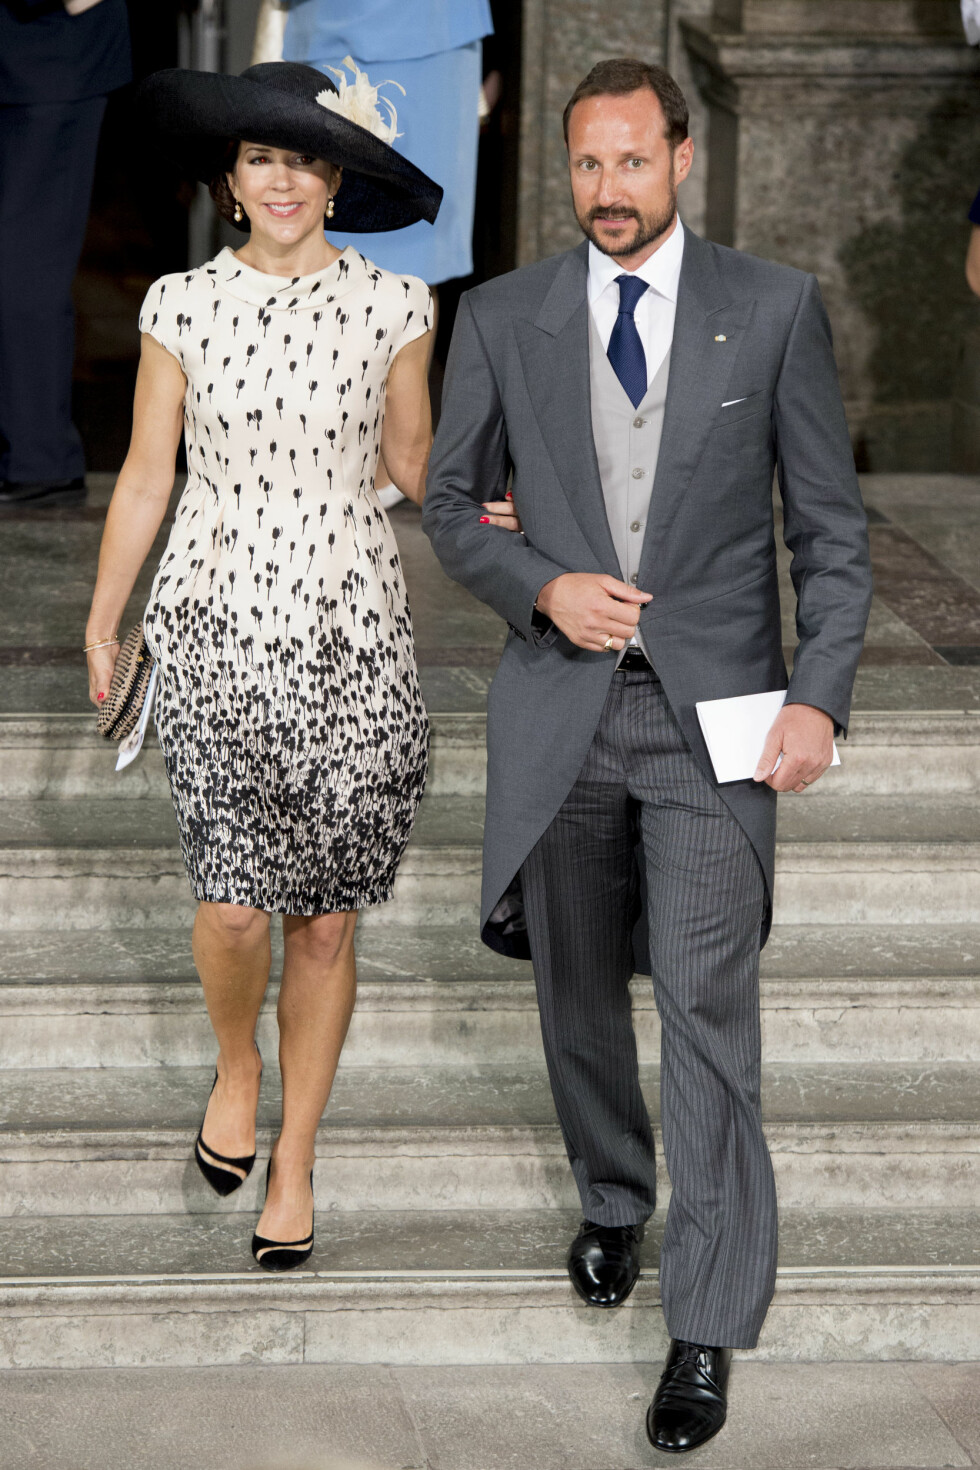 HAAKONS PLUS ONE: Kronprinsesse Mary var kronprins Haakons «date» da prins Oscar ble døpt i mai. Deres ektefeller, kronprinsesse Mette-Marit og kronprins Frederik, var begge faddere til den lille prinsen. Foto: NTB Scanpix